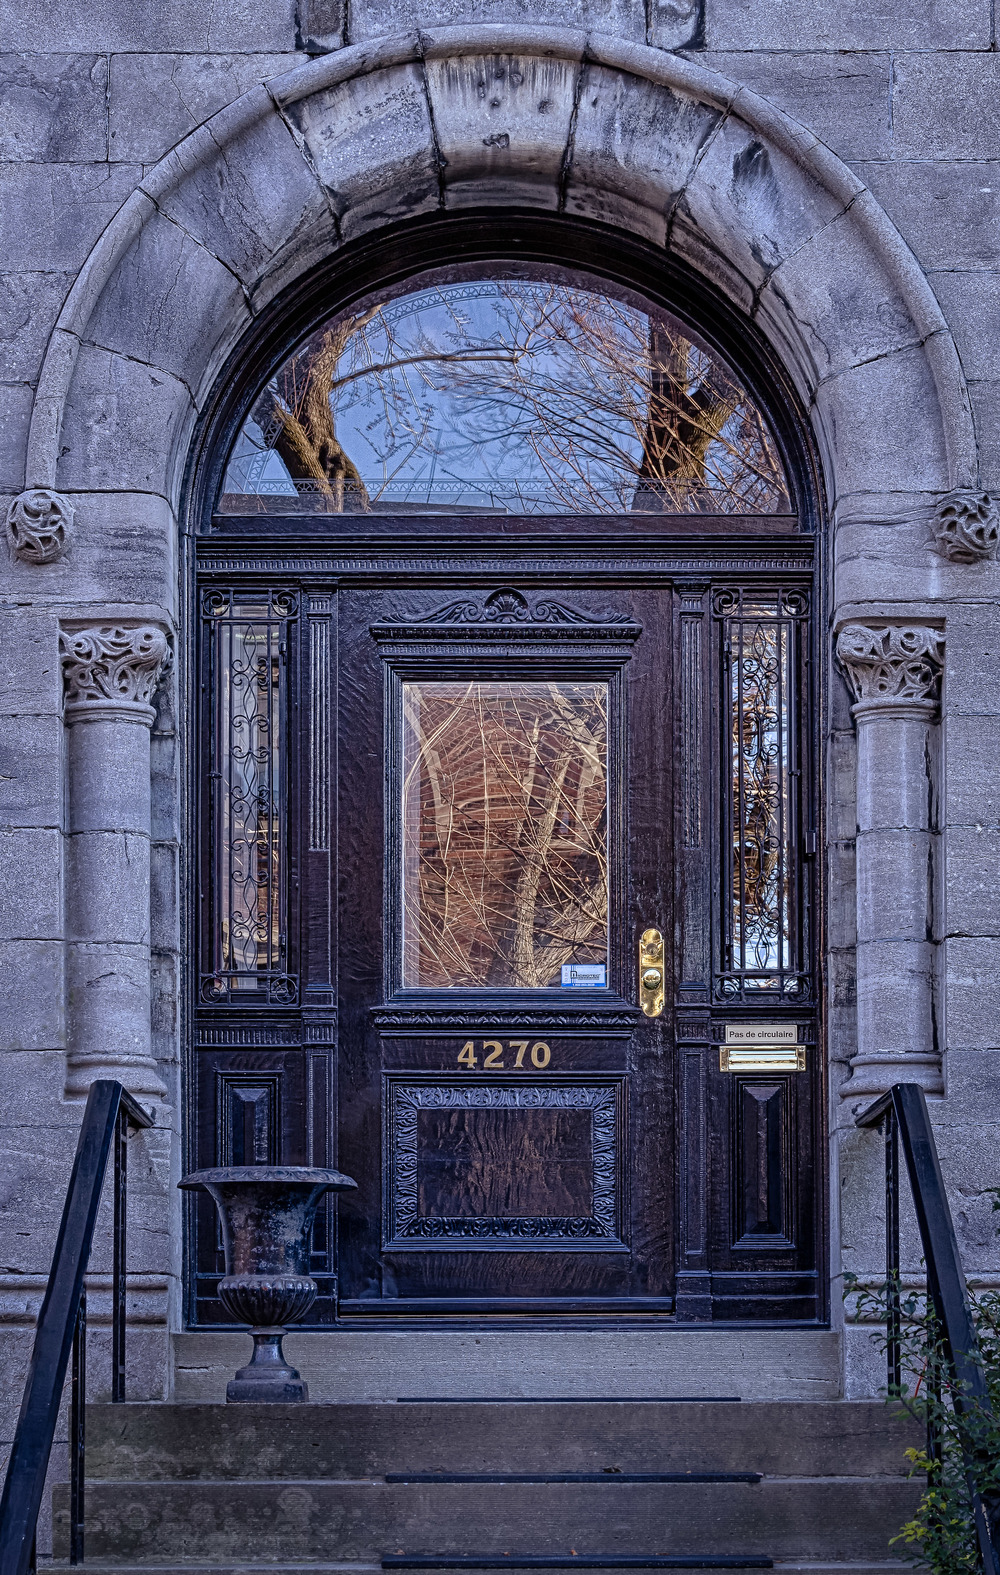 20131207_Doors-Maisonneve near Wood St.__MG_2074_HDR-Edit.jpg